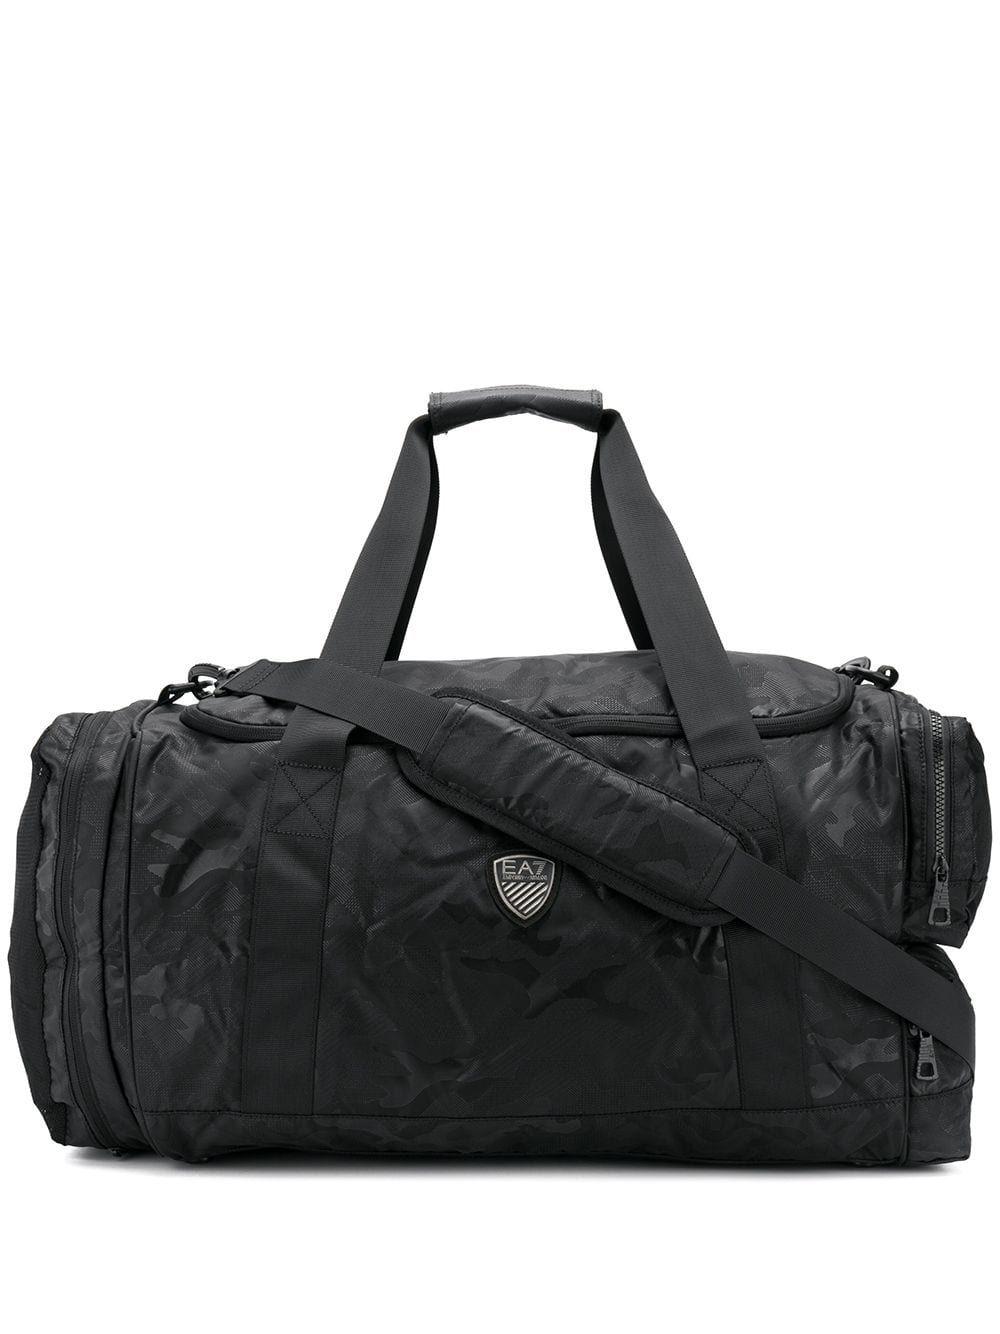 f4ad65894643 EA7 EMPORIO ARMANI EA7 EMPORIO ARMANI LOGO PATCH HOLDALL - BLACK.   ea7emporioarmani  bags